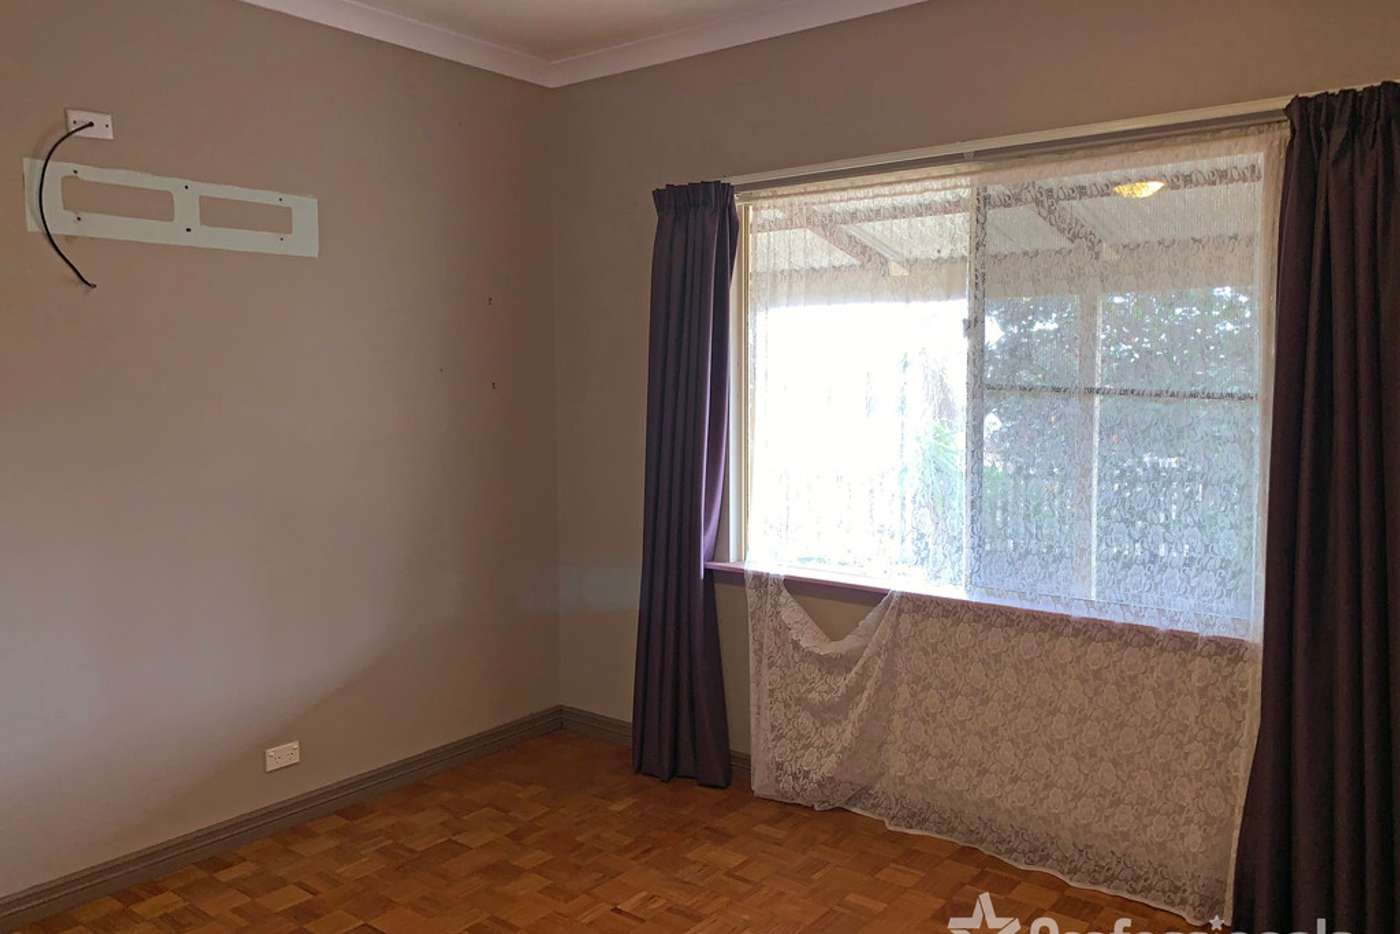 Sixth view of Homely house listing, 373 Greenough Road, Walkaway WA 6528